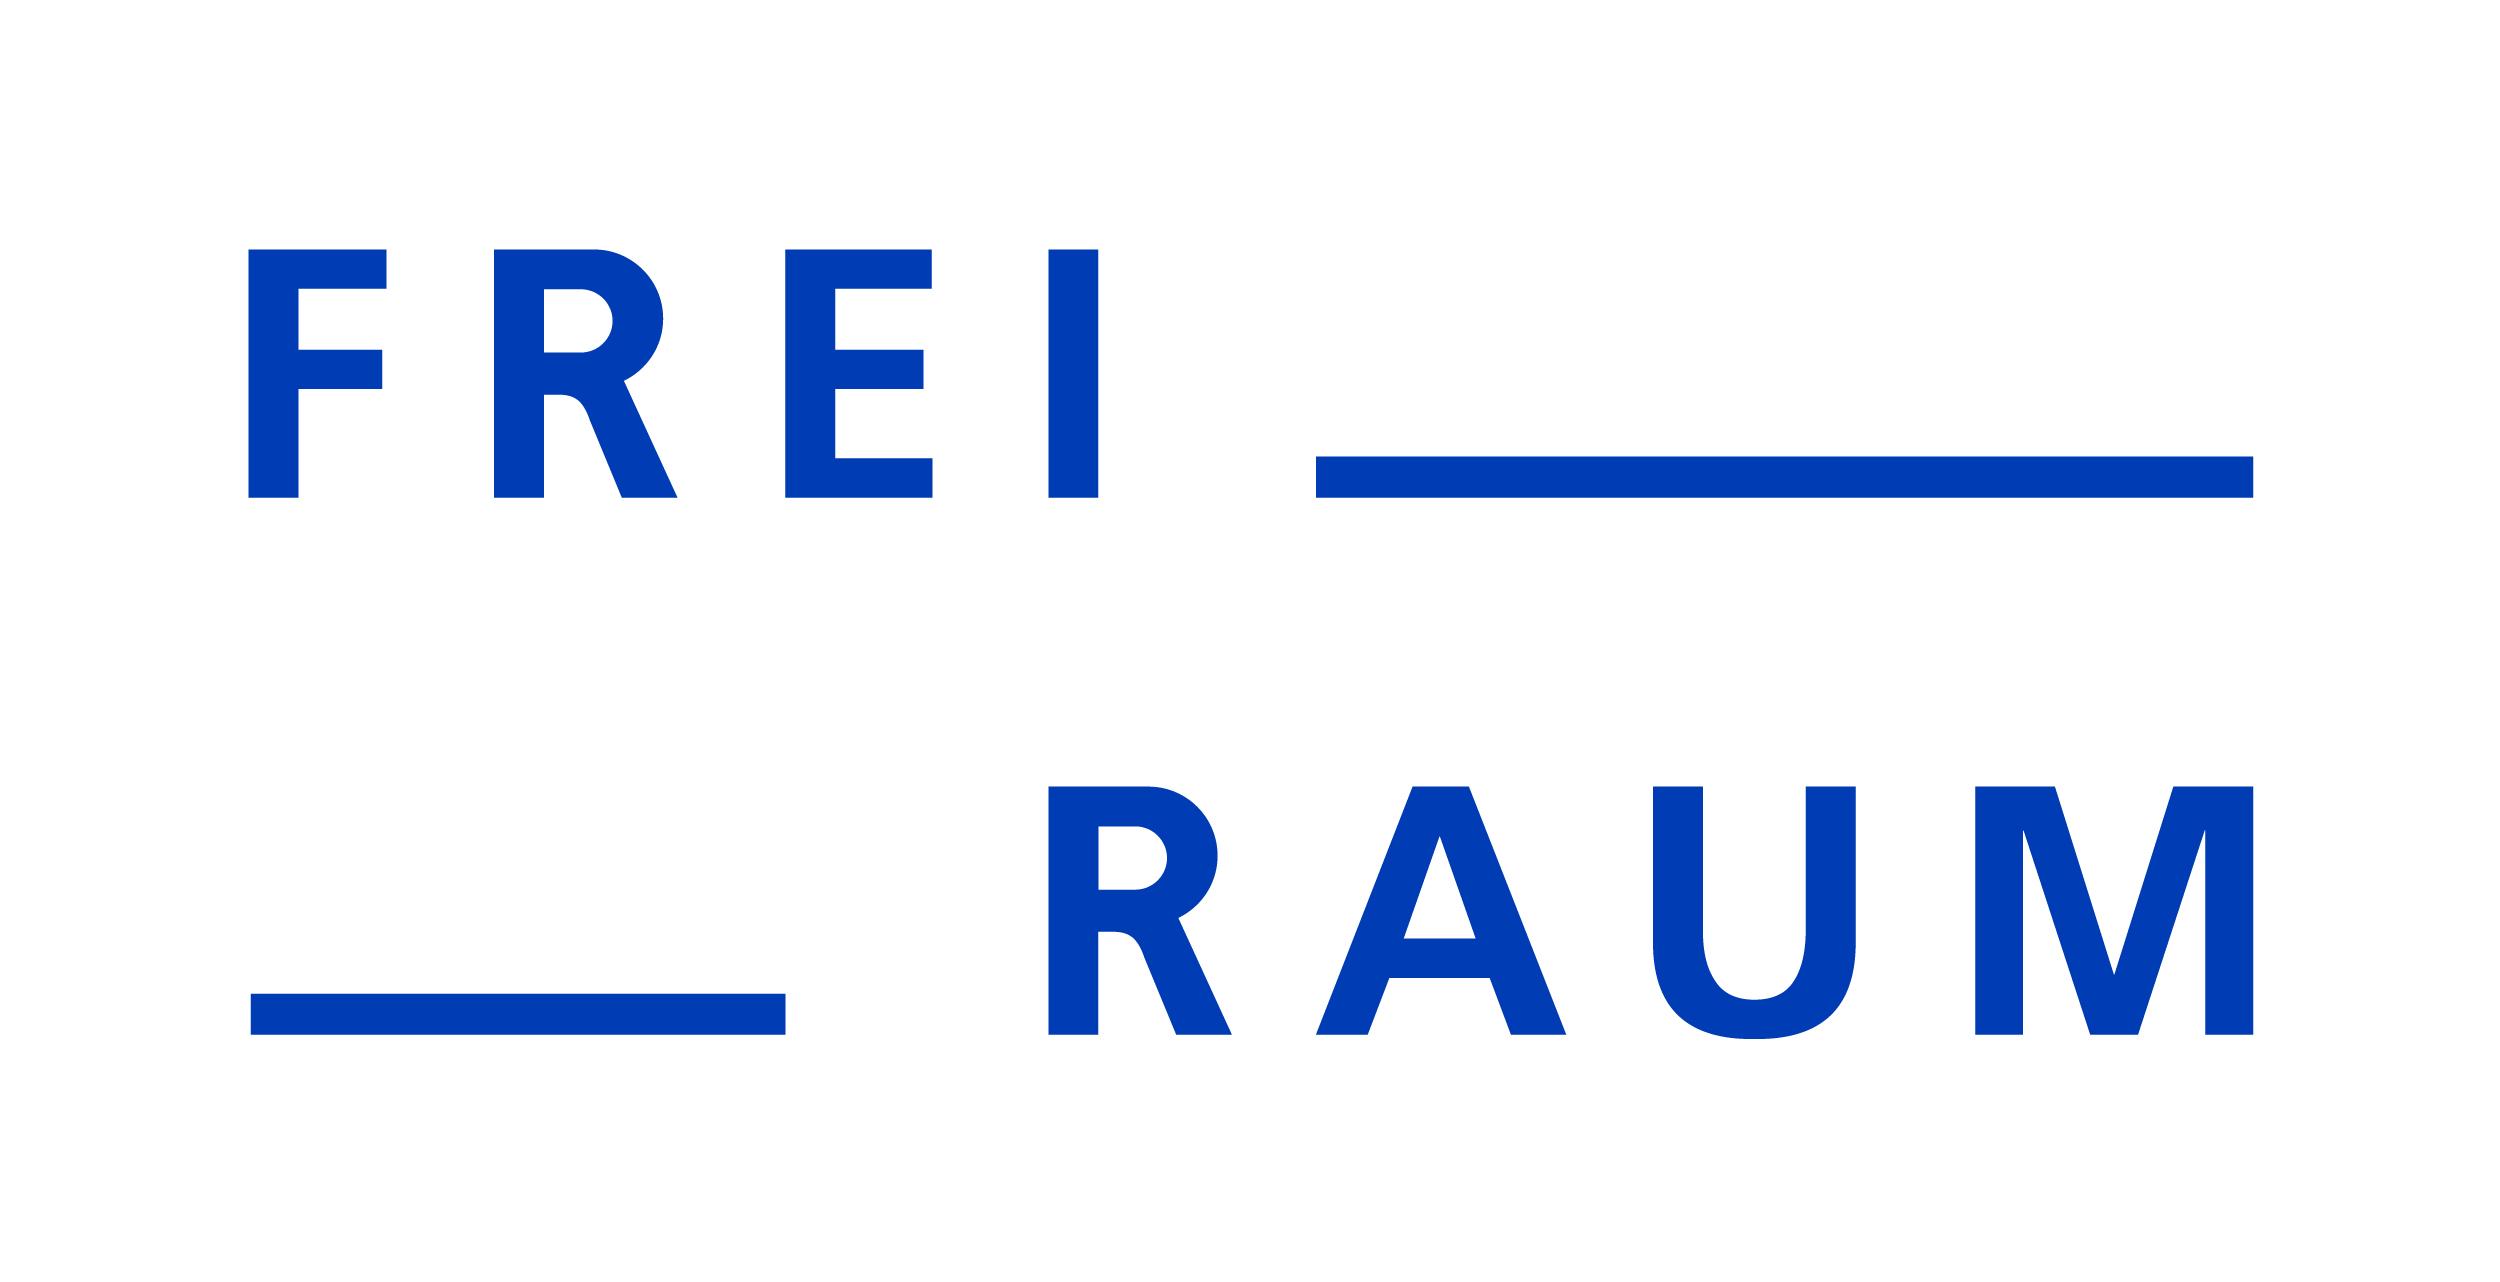 Freiraum-Logo-zkb-zurcher-kantonalbank-corporate-wellbeing-productivity.jpg